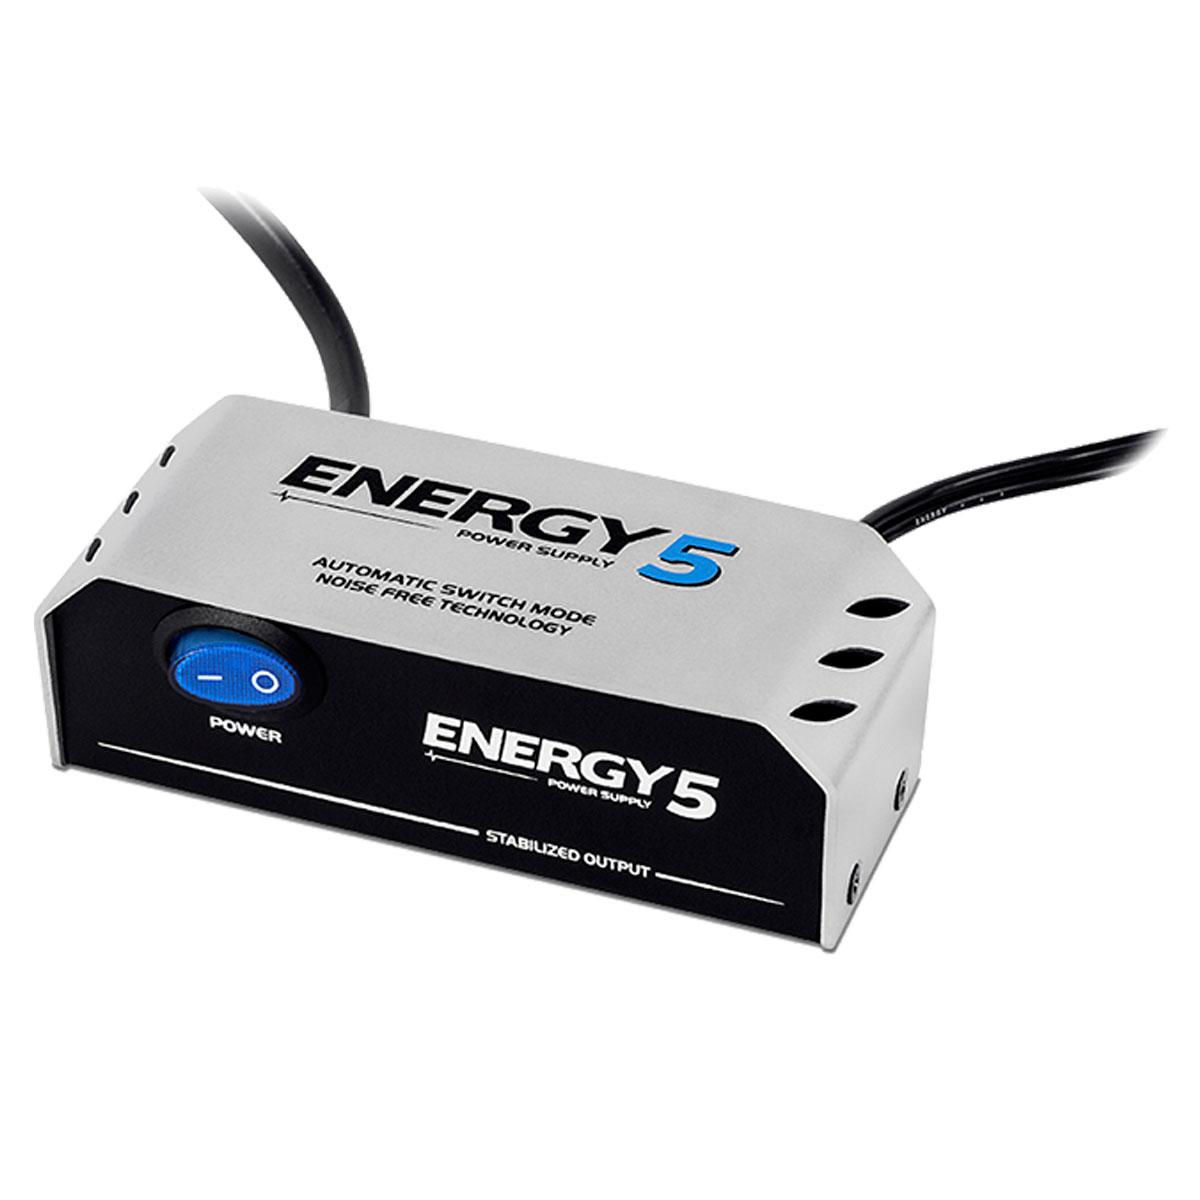 Fonte Automática de 5 Plugs 9V DC 1000mA - Energy 5 Landscape